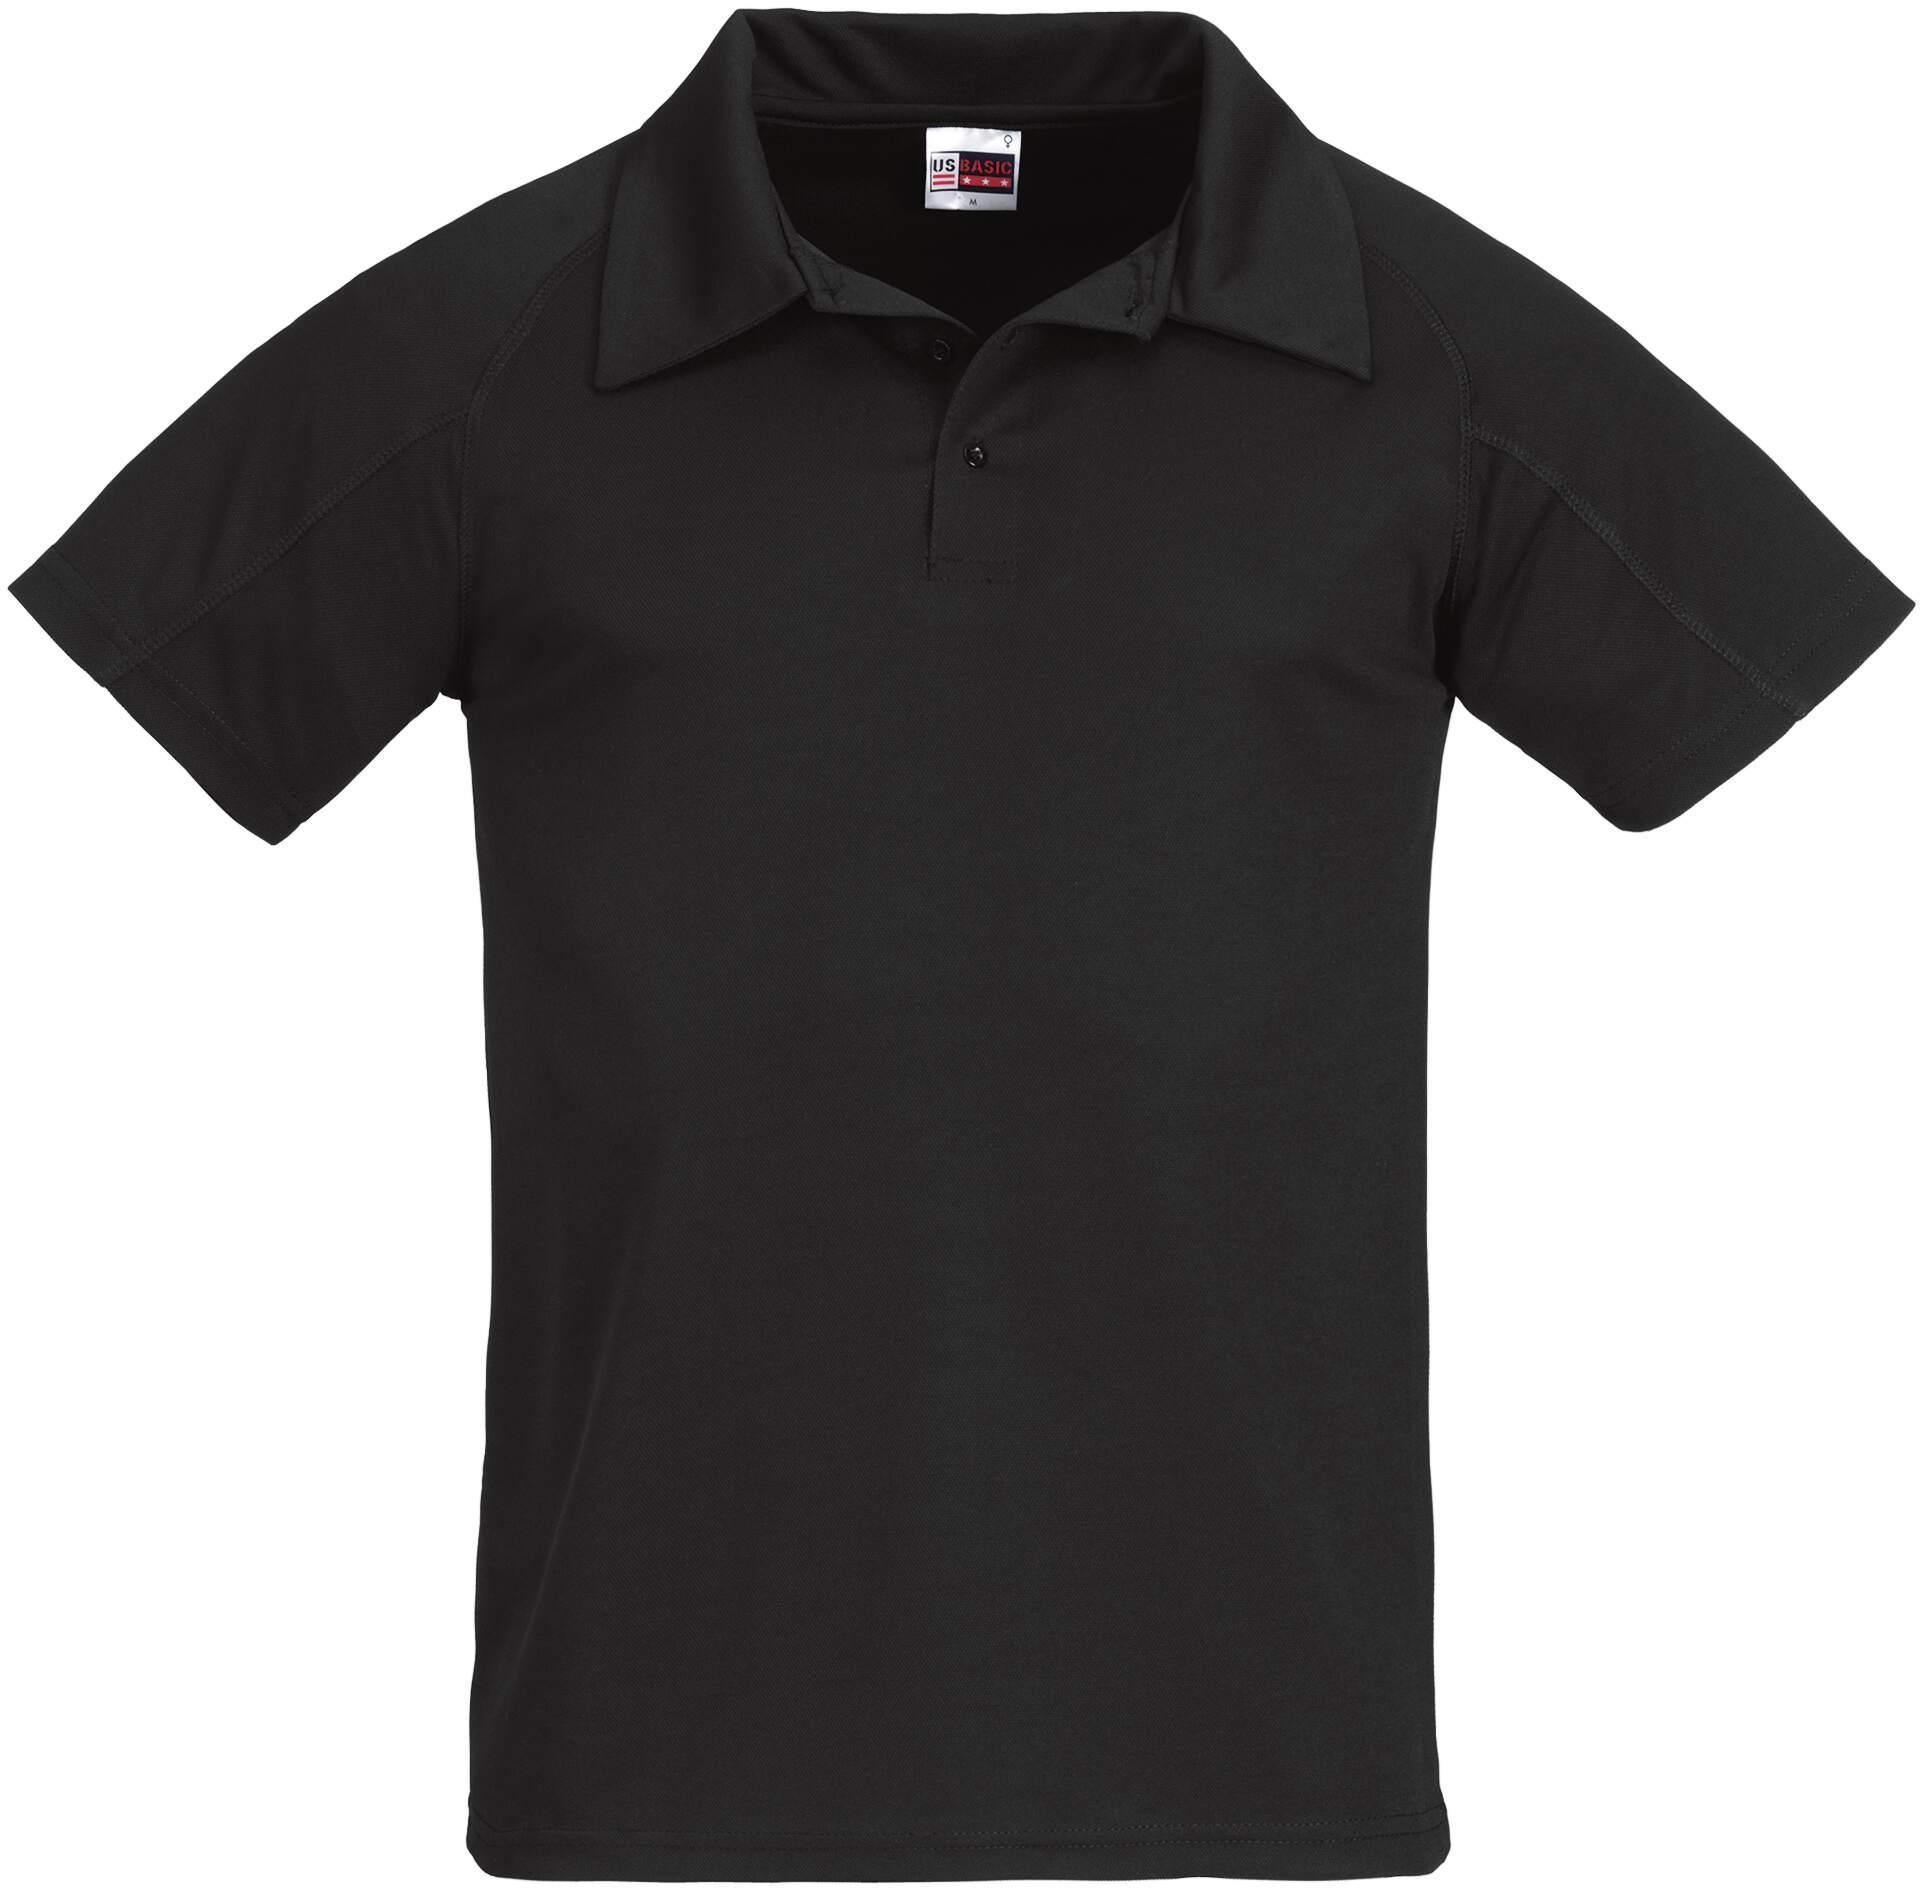 Koszulki Polo US 31098 Cool Fit - 31098_czarny_US - Kolor: Czarny